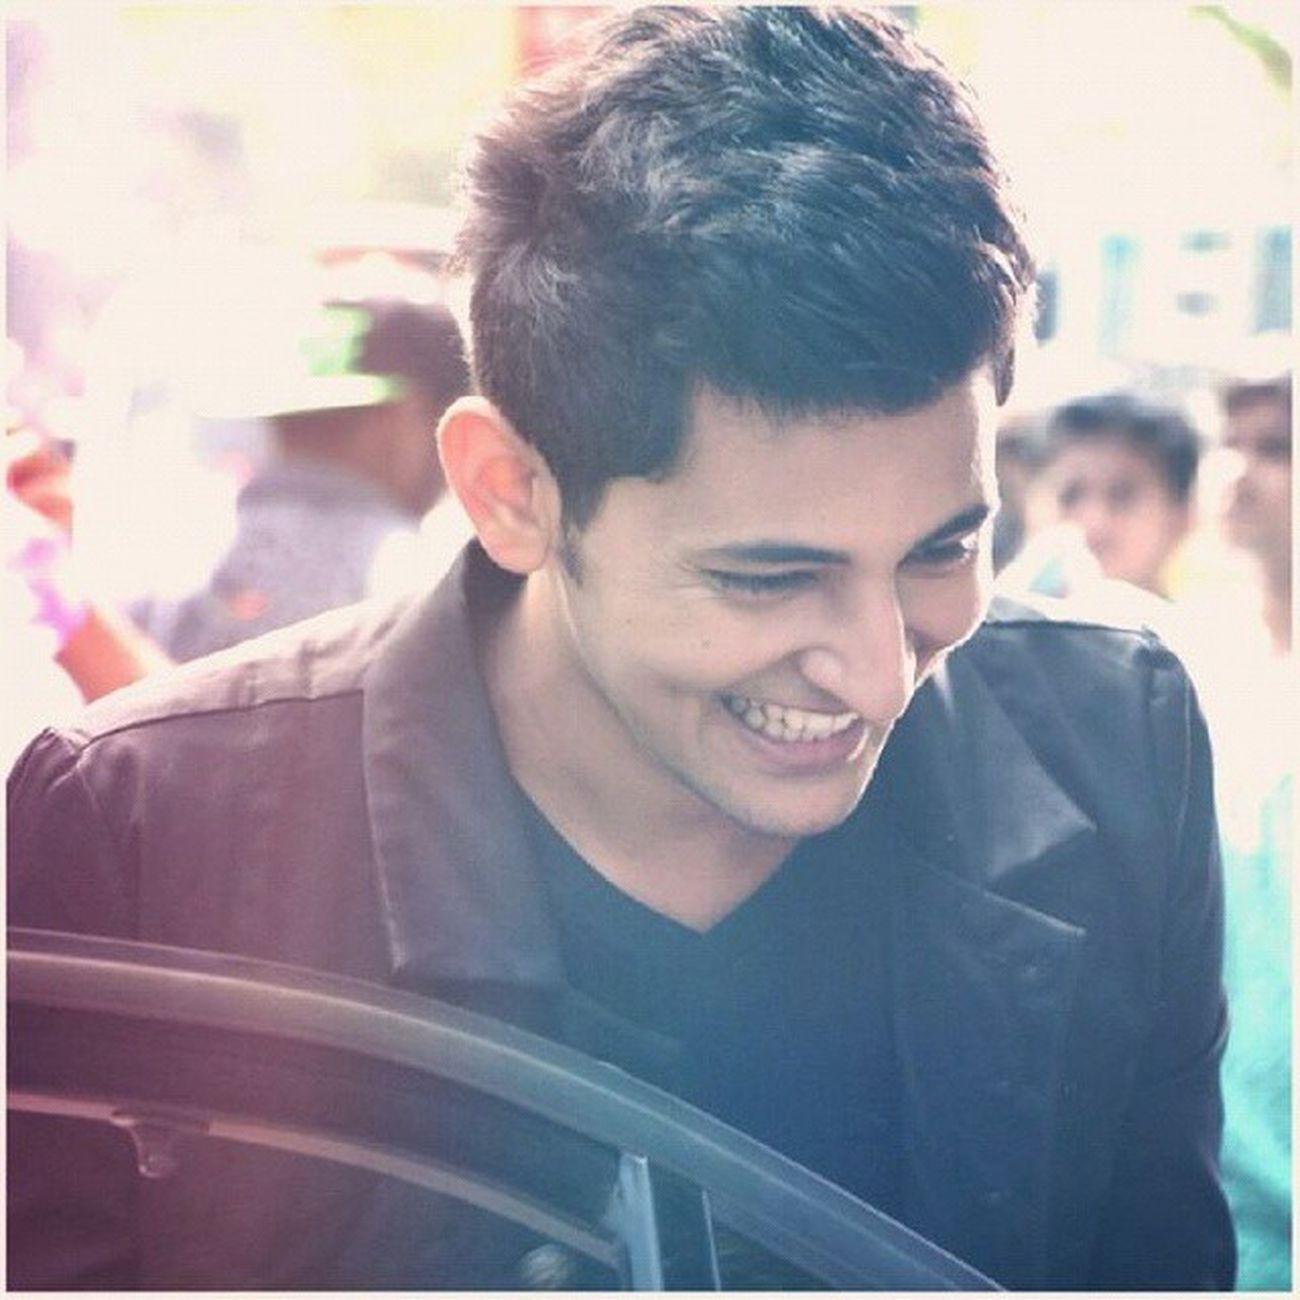 His smile.... Keep smiling like this.... Bestlucksir Respectusir @darshanravaldz